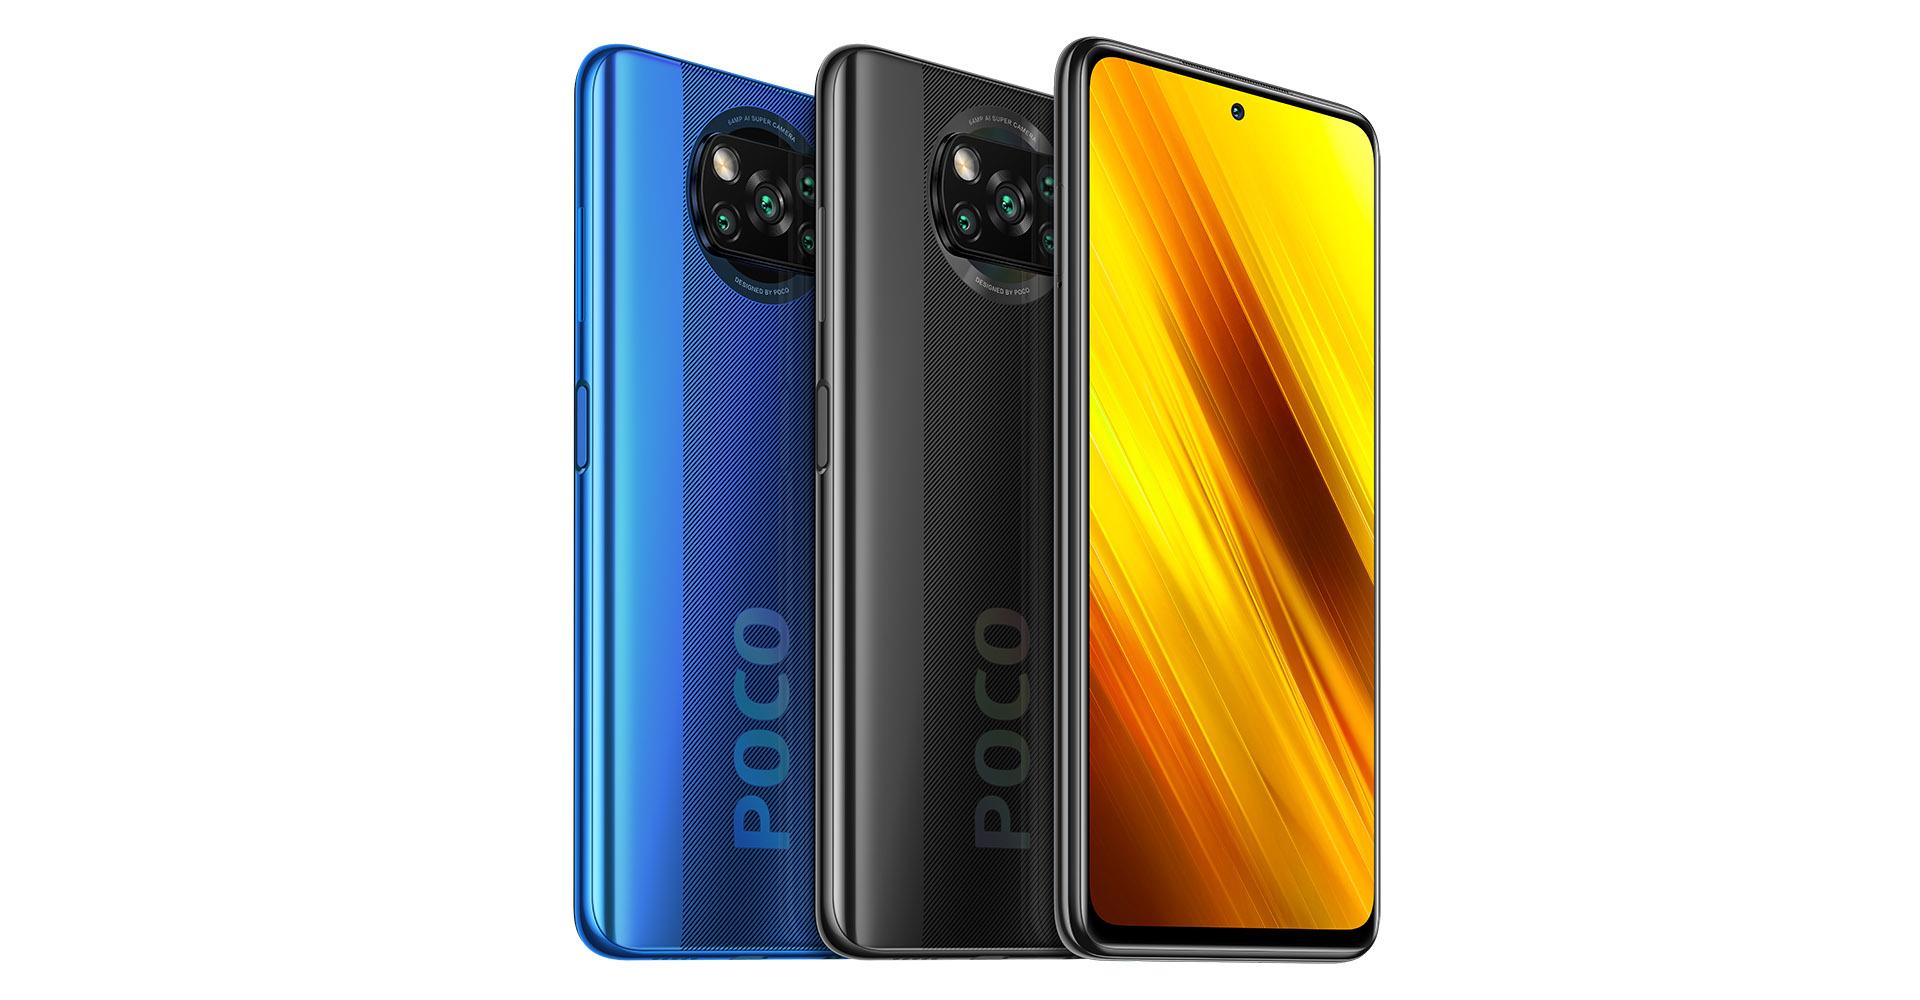 Das Xiaomi Poco X3 NFC in drei Farben